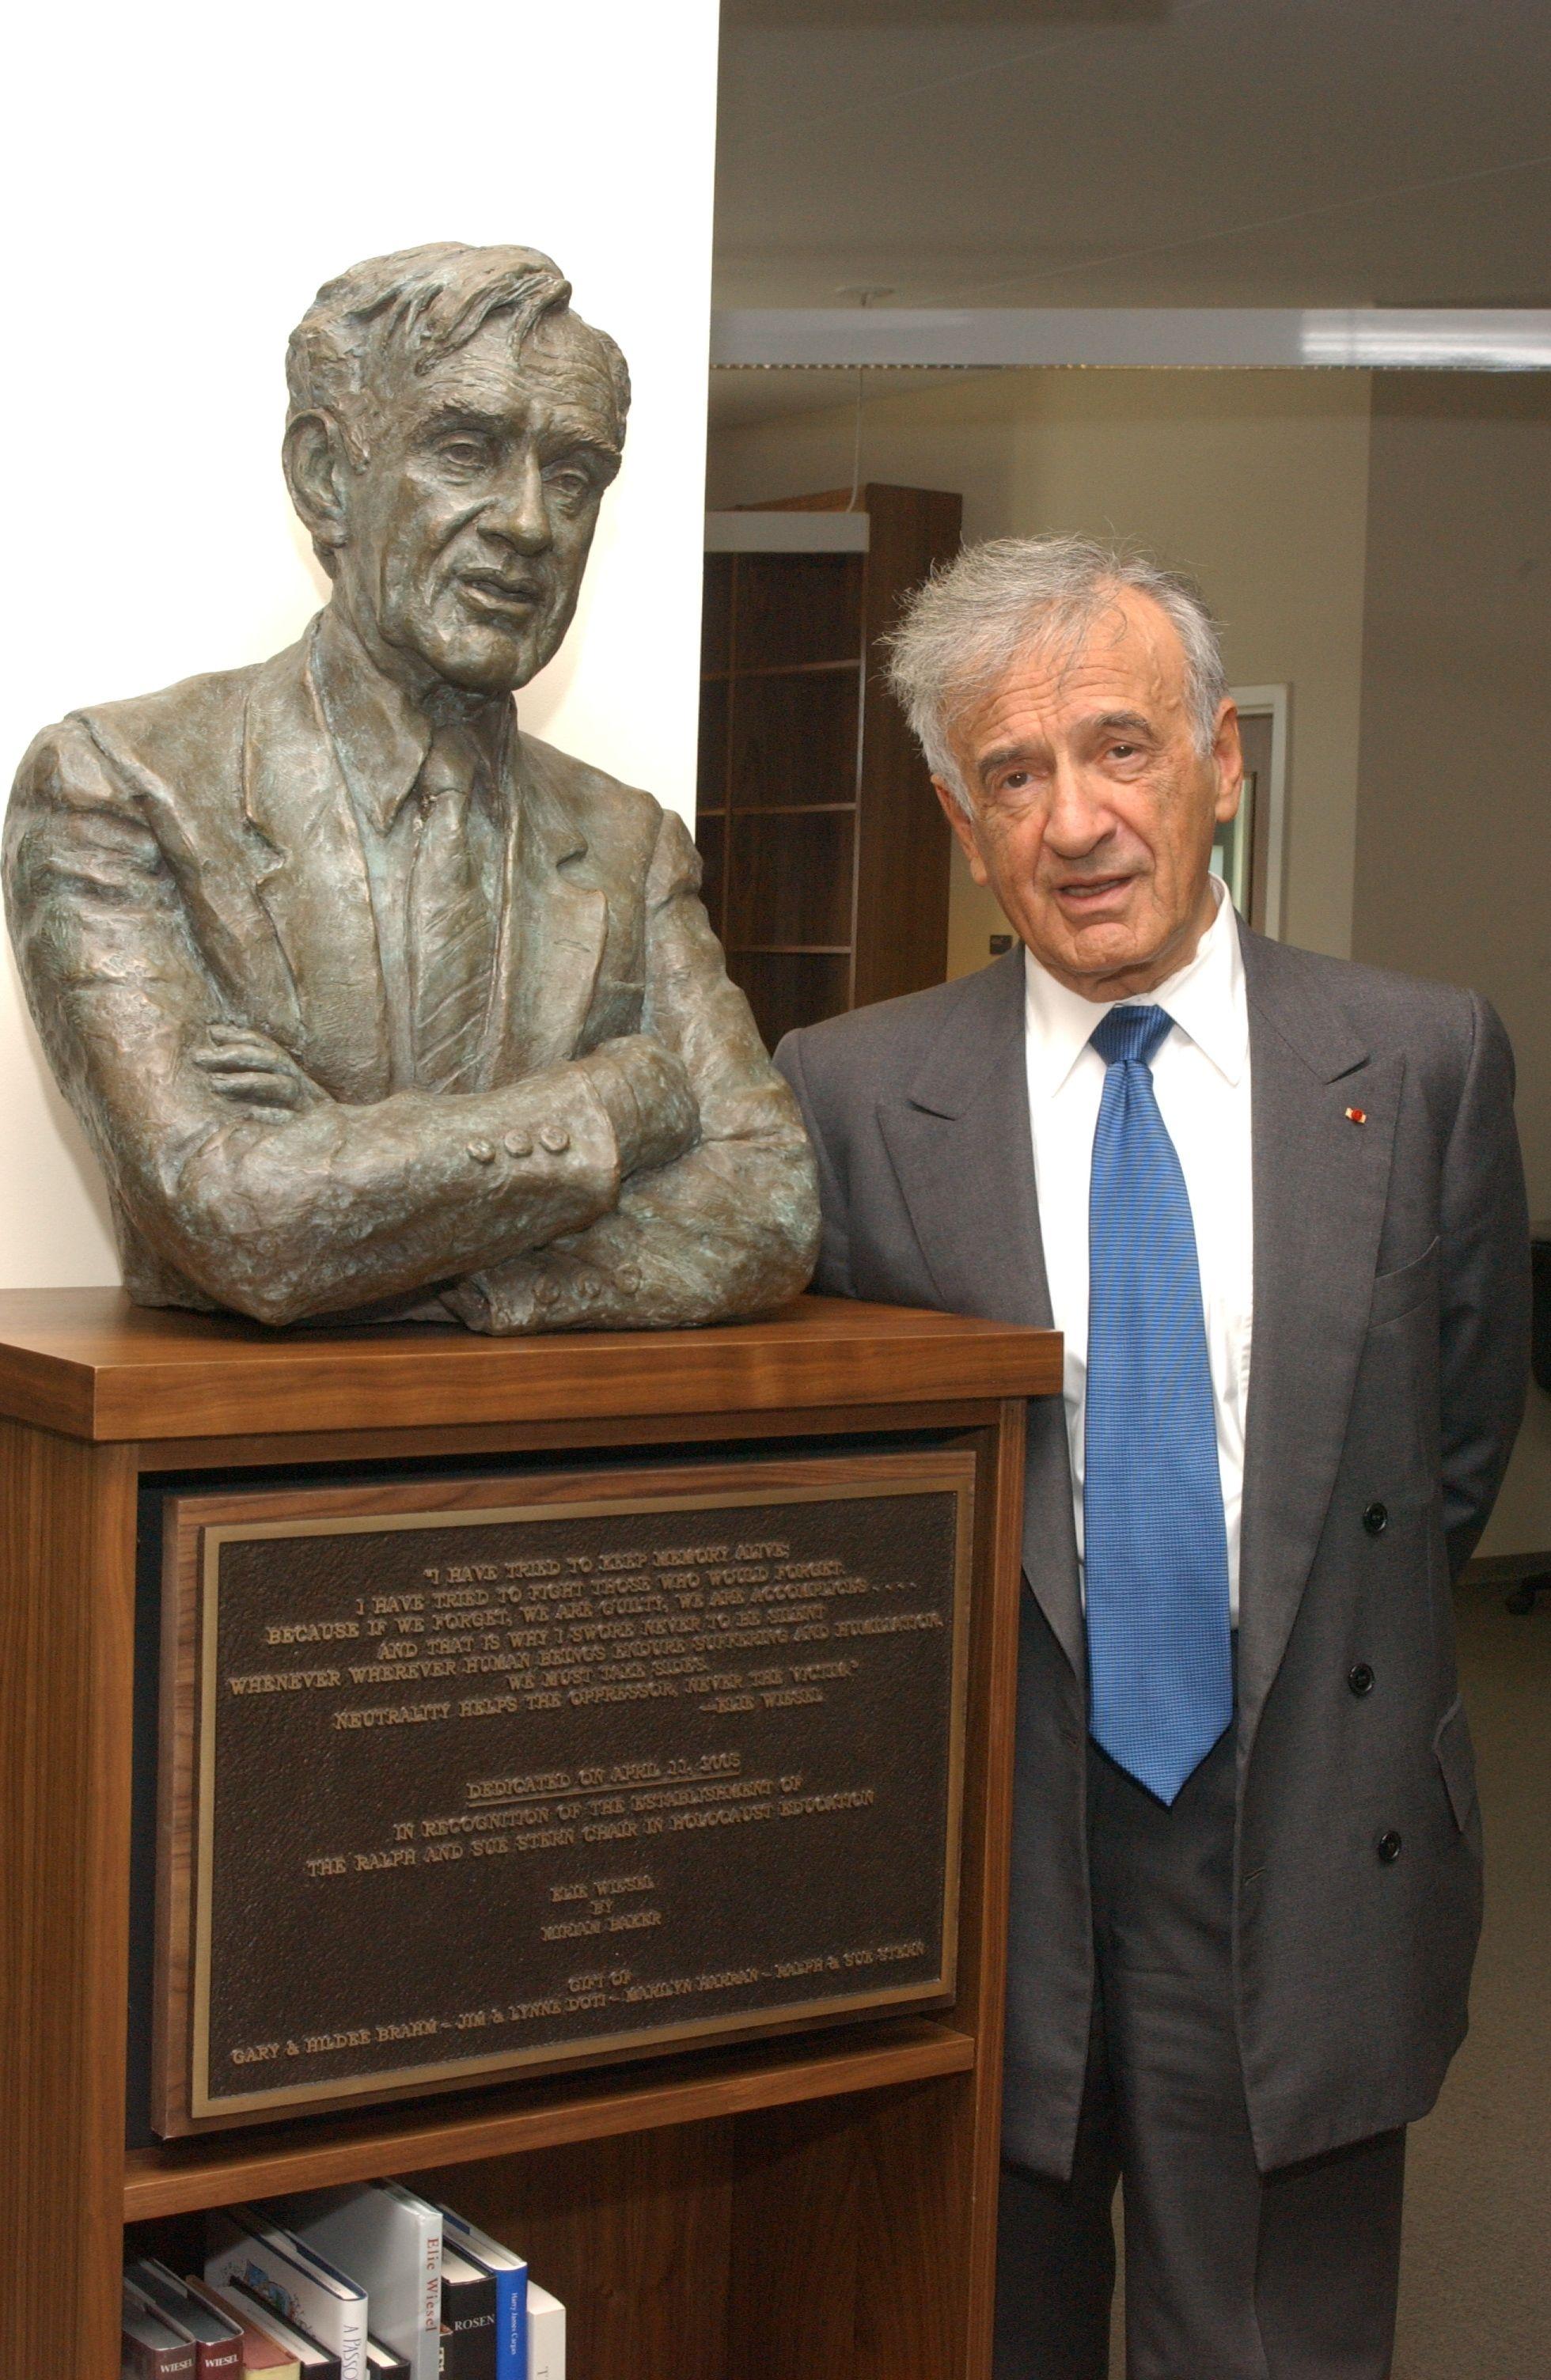 Elie Wiesel and his Nobel Prize | LÍDERES DE ISRAEL | Pinterest